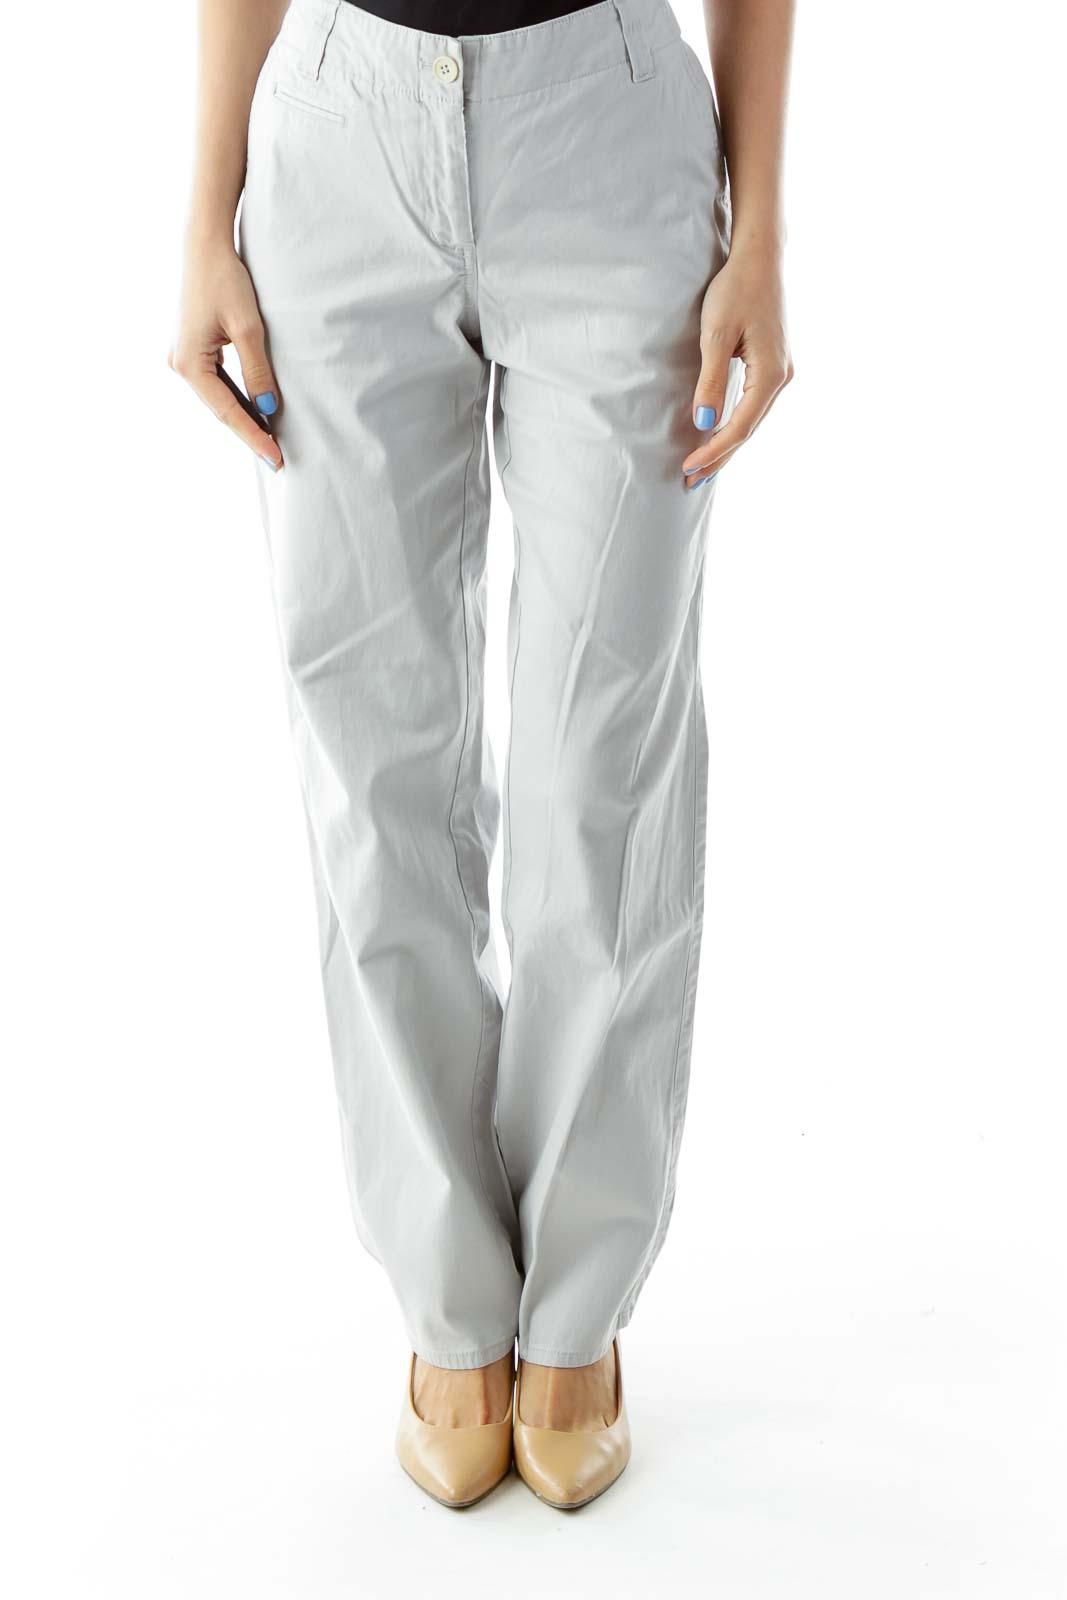 Gray Denim Boyfriend Jeans